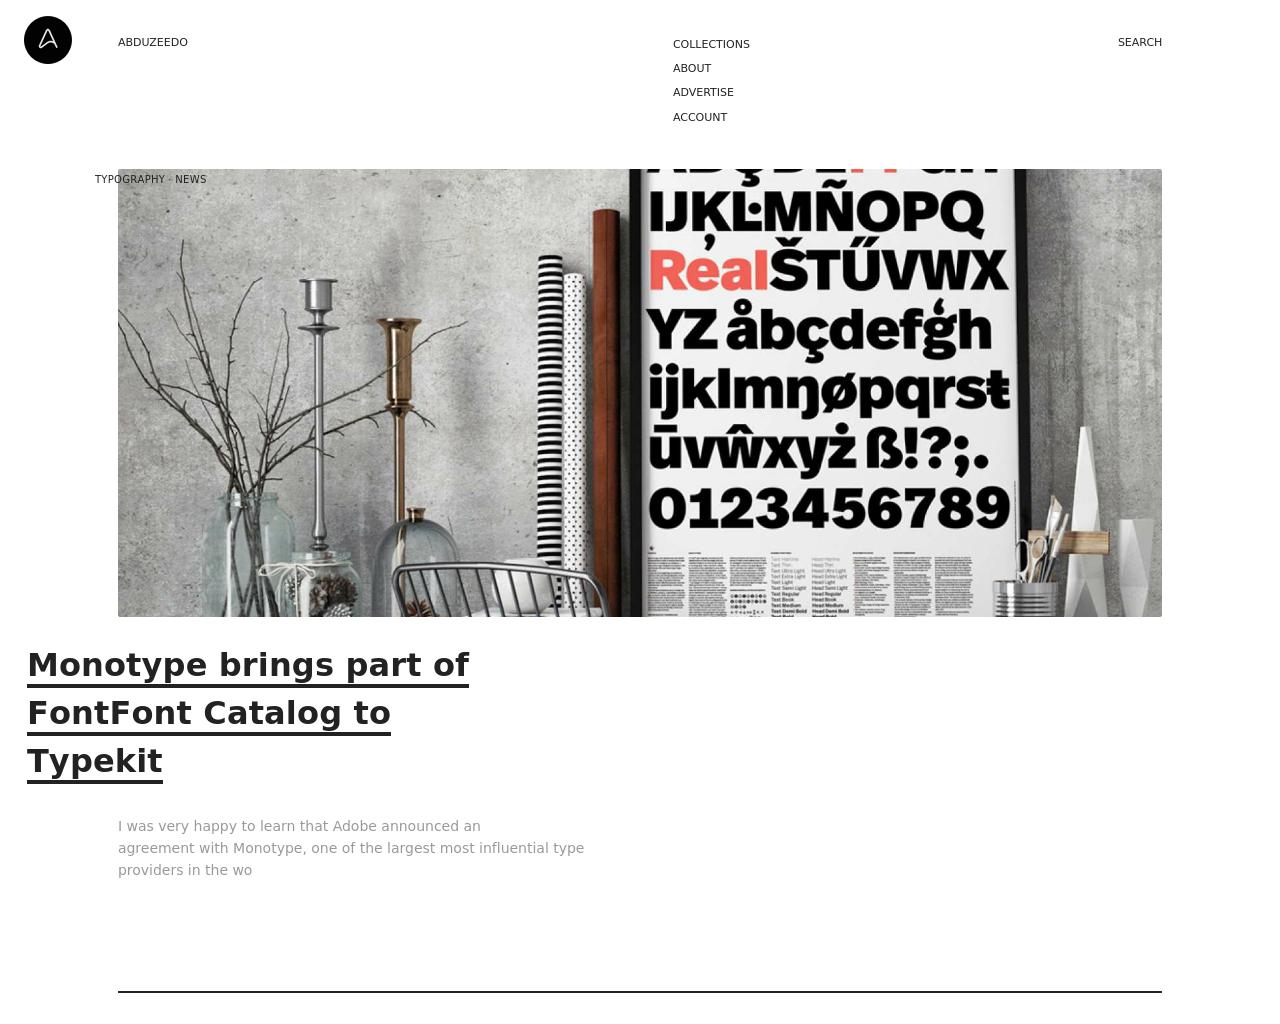 Abduzeedo-Design-Inspiration-Advertising-Reviews-Pricing